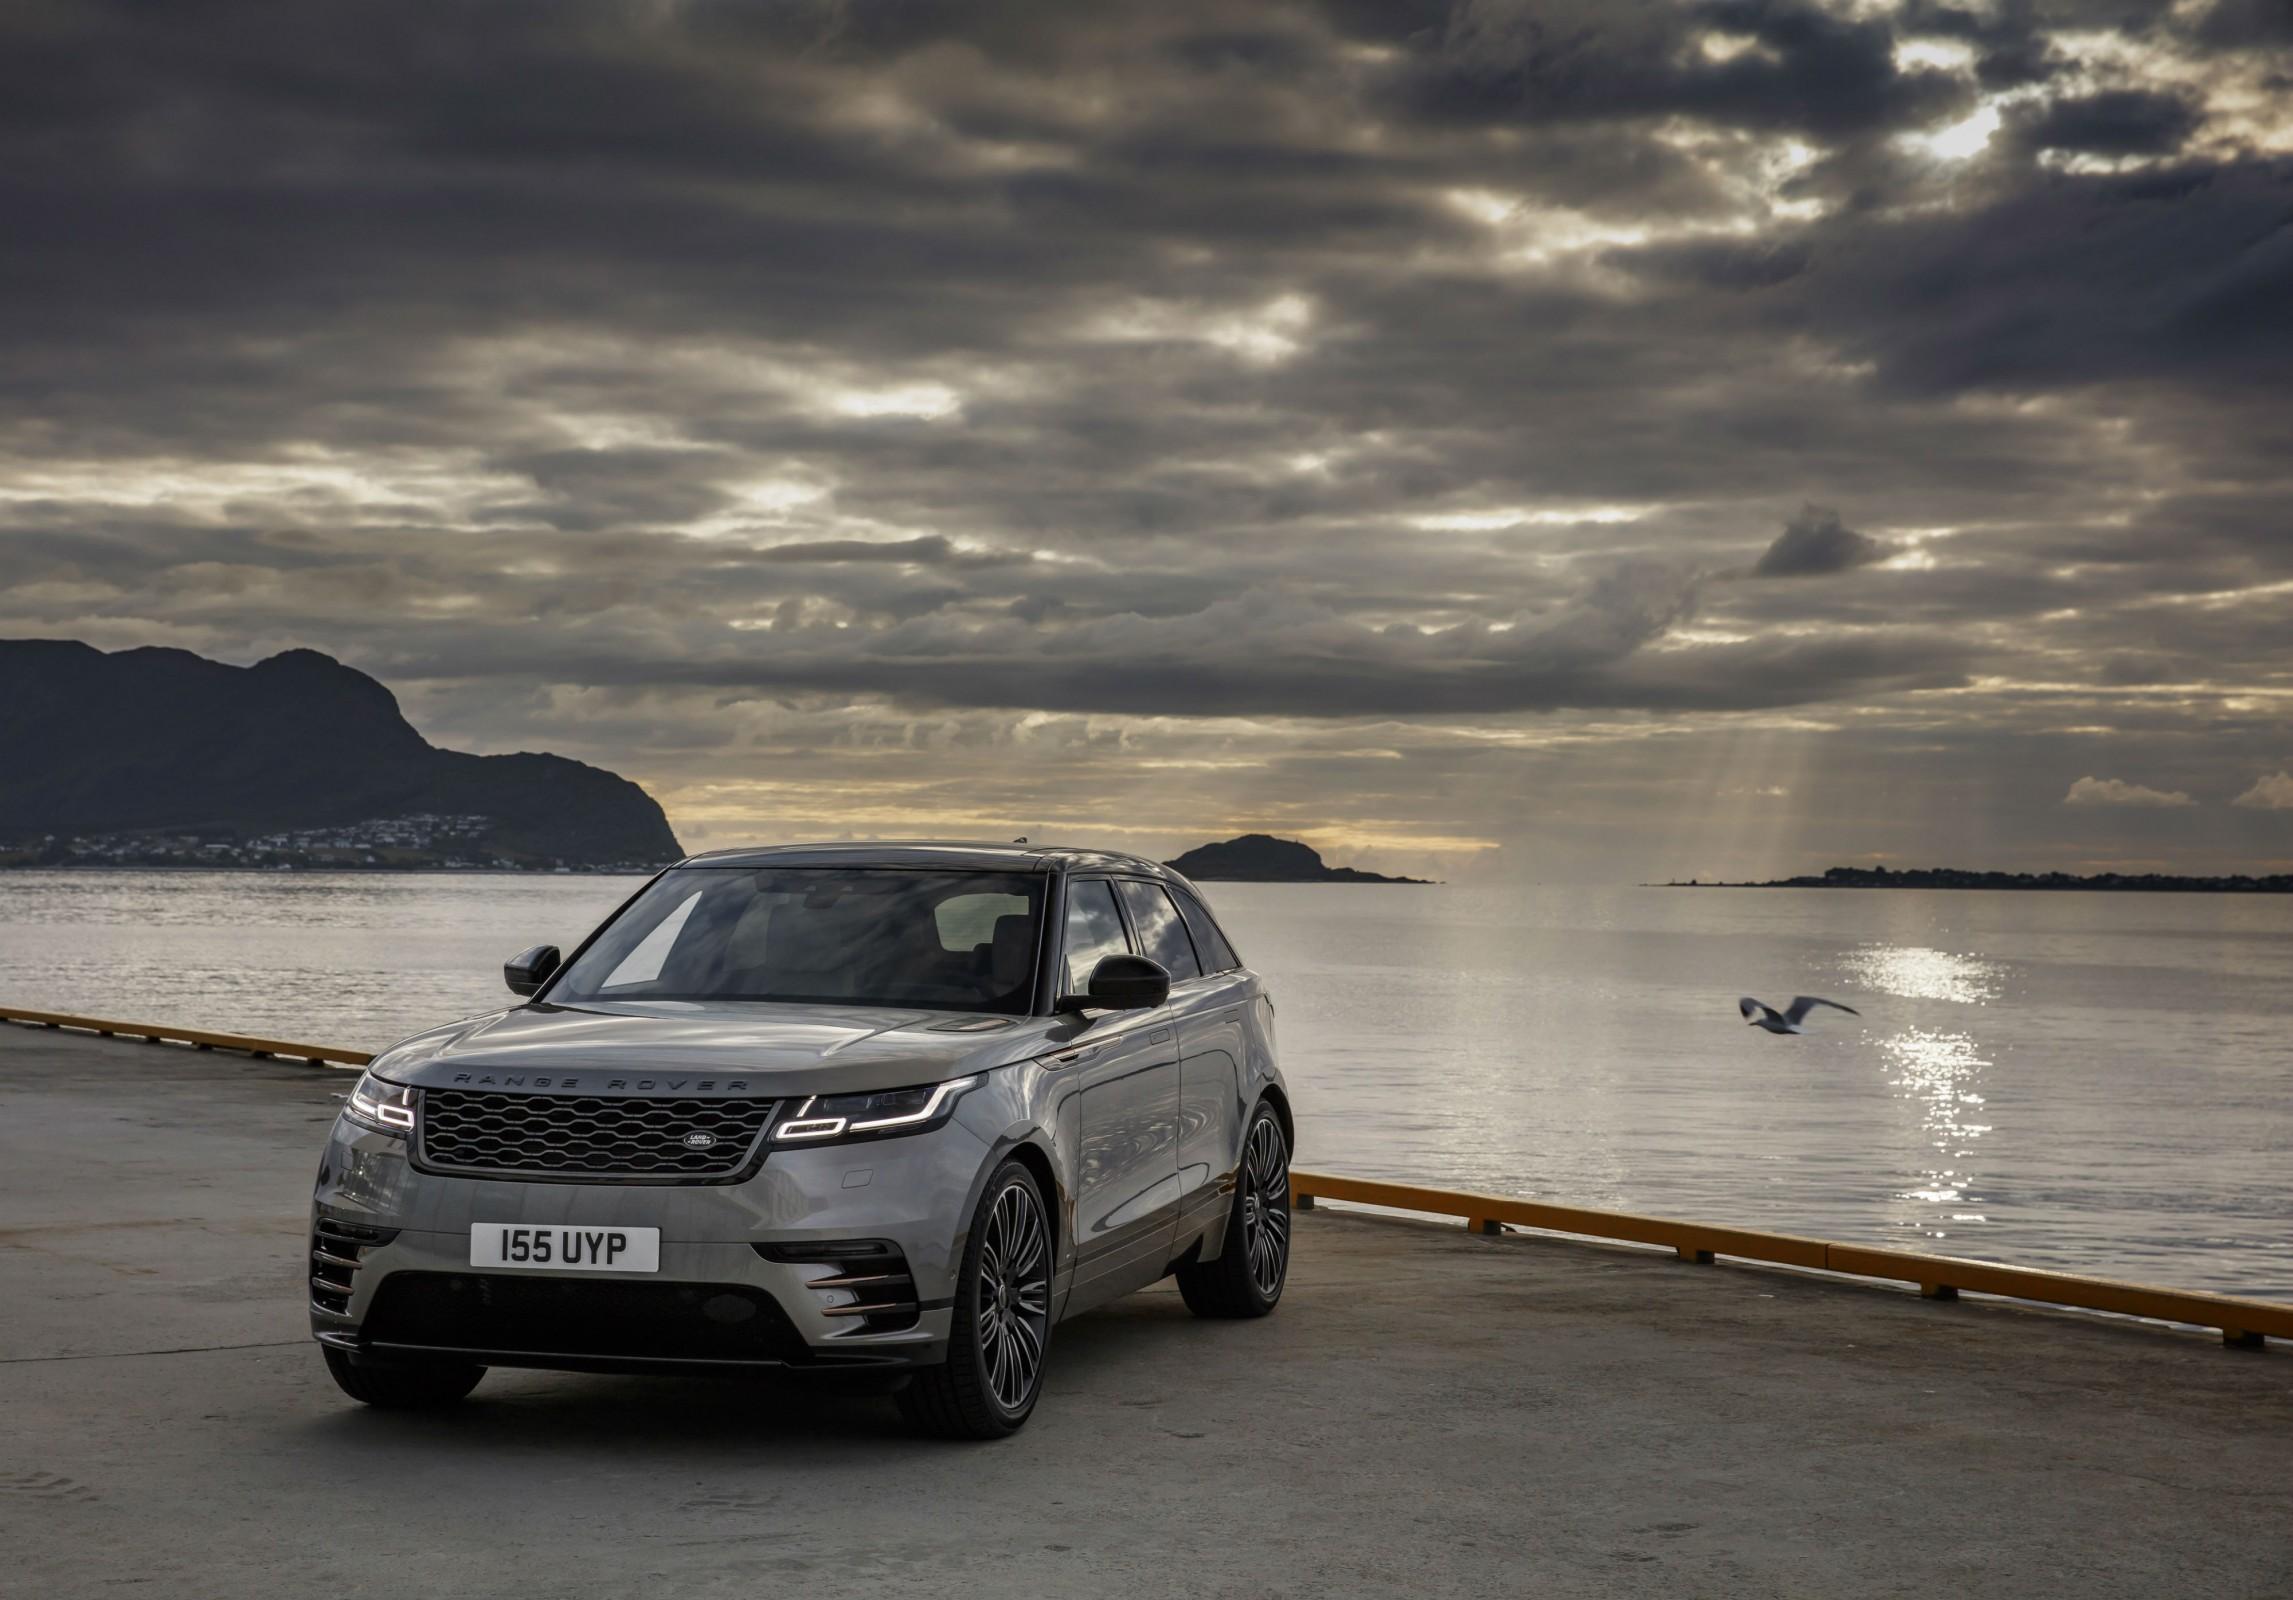 Land Rover Range Rover Velar First Edition